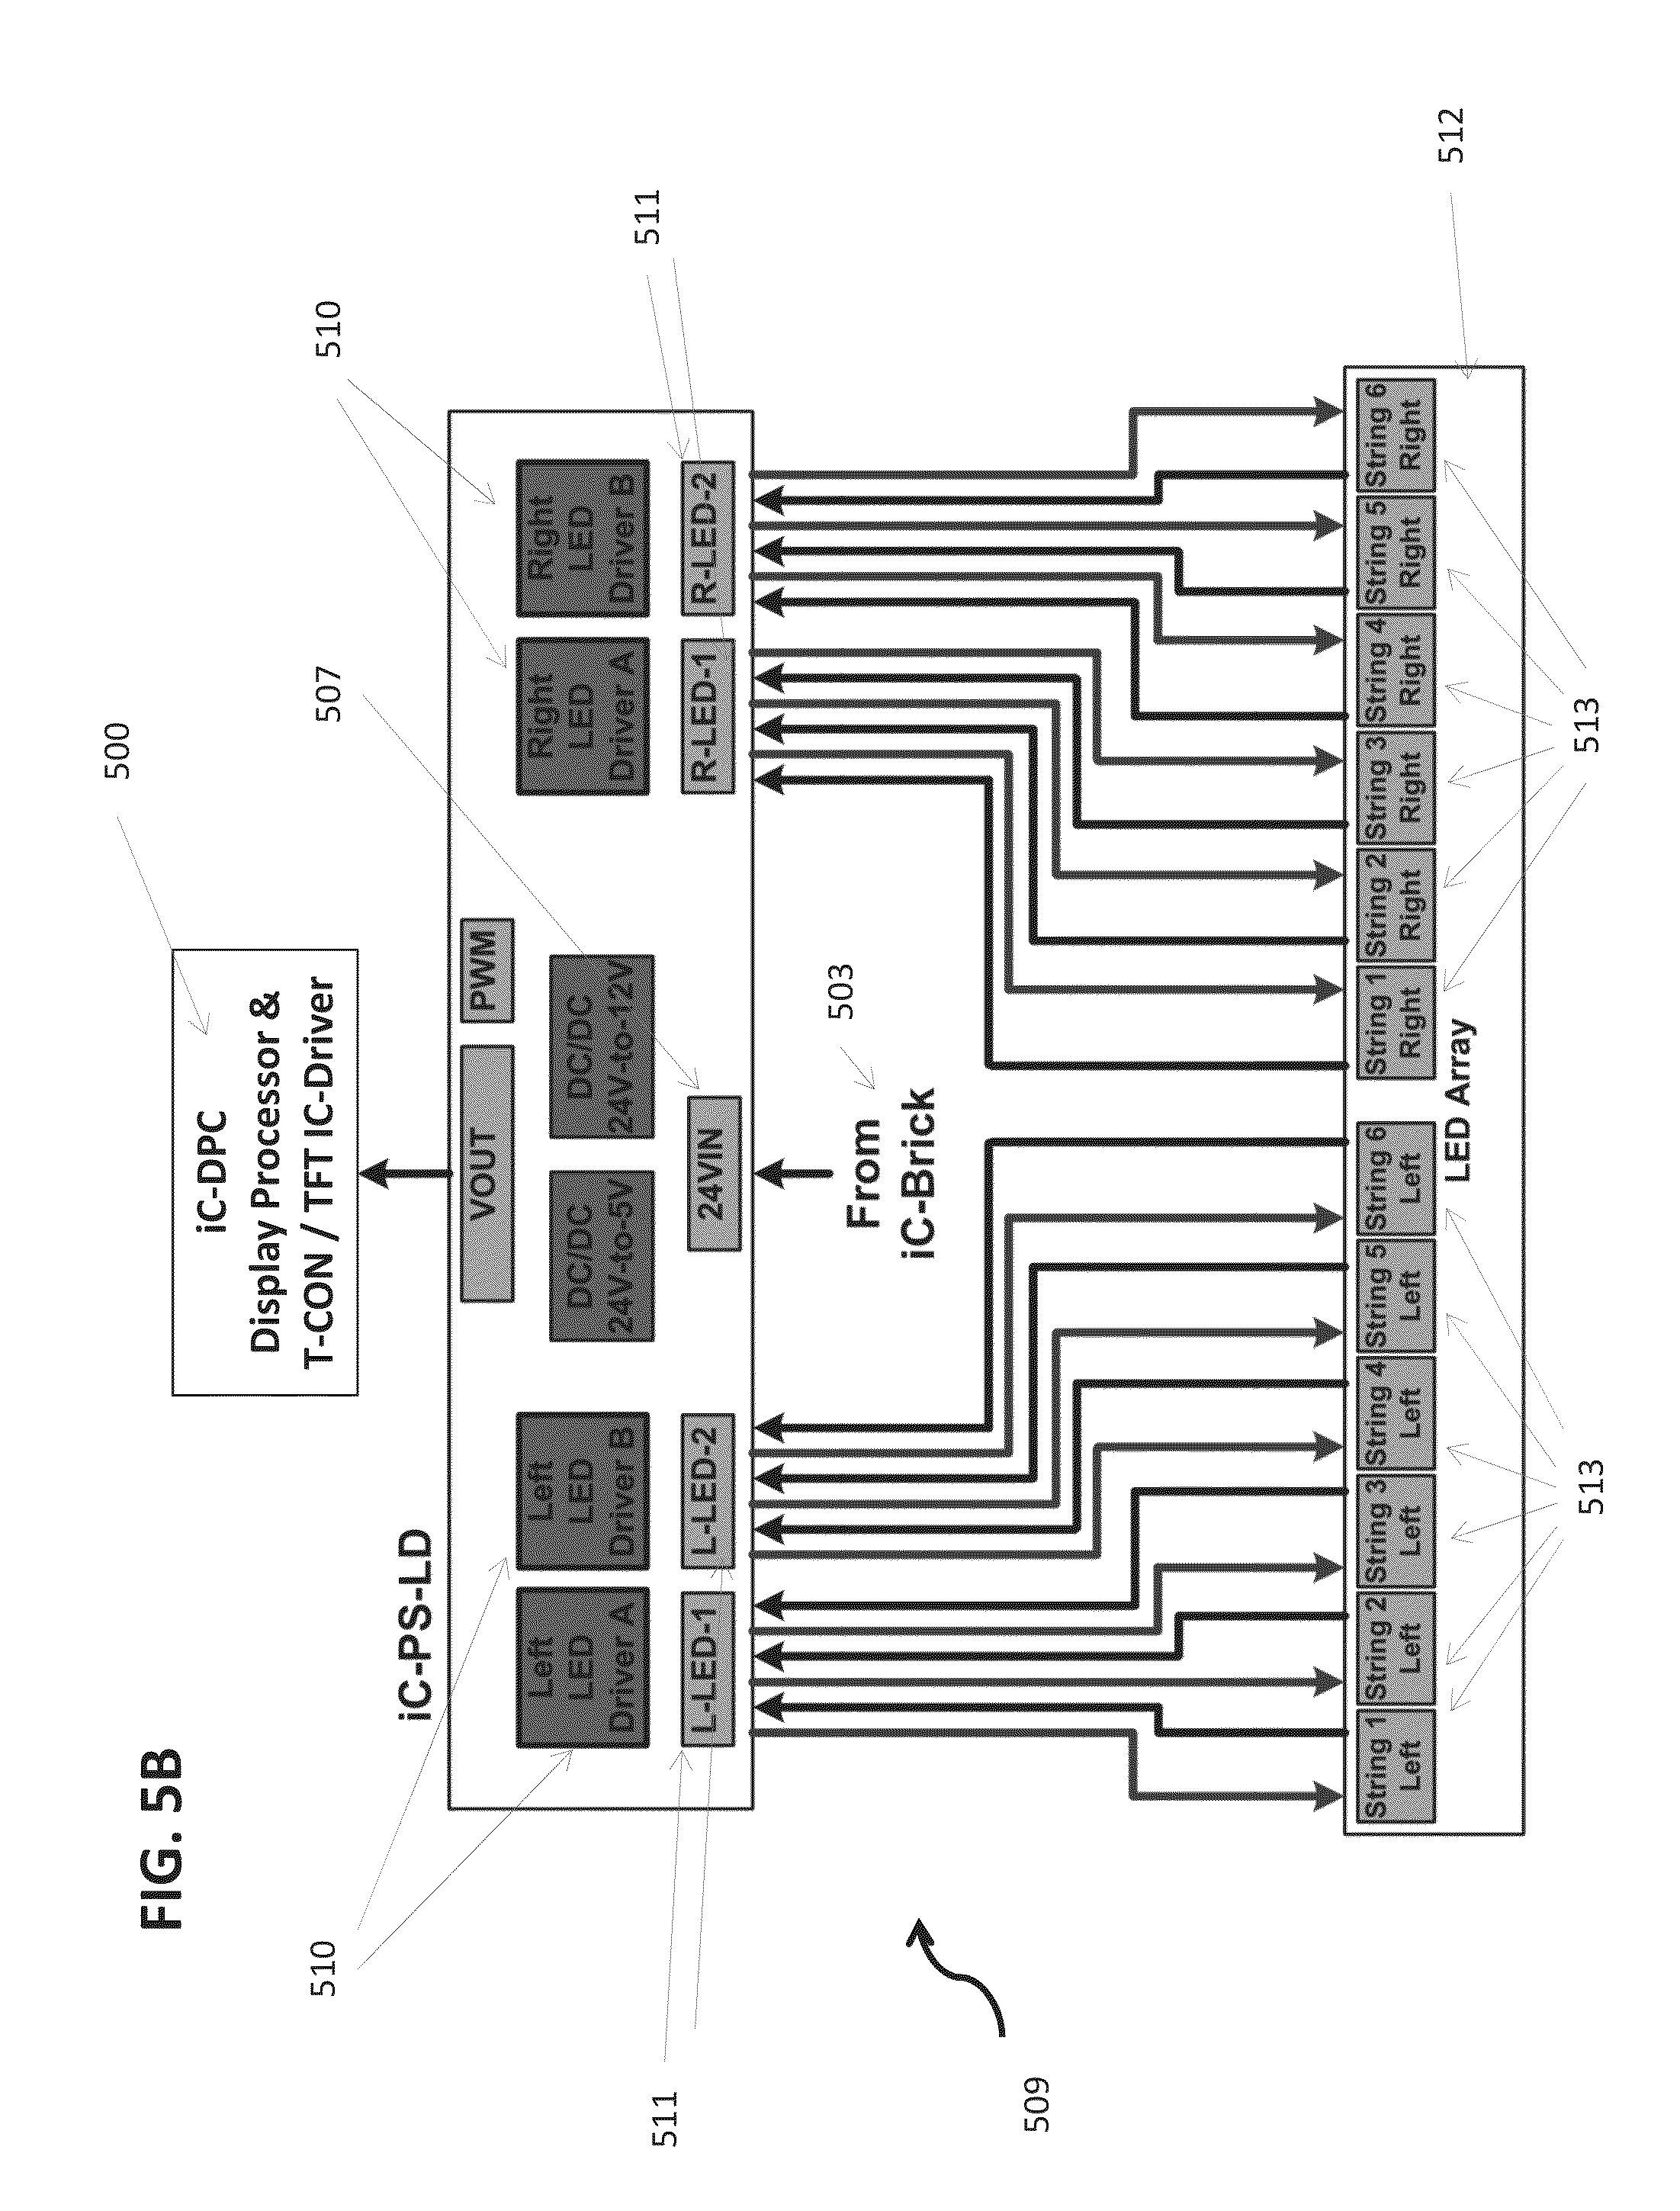 Power Supply Circuit Control Board W Transformer Fits Lifestyler